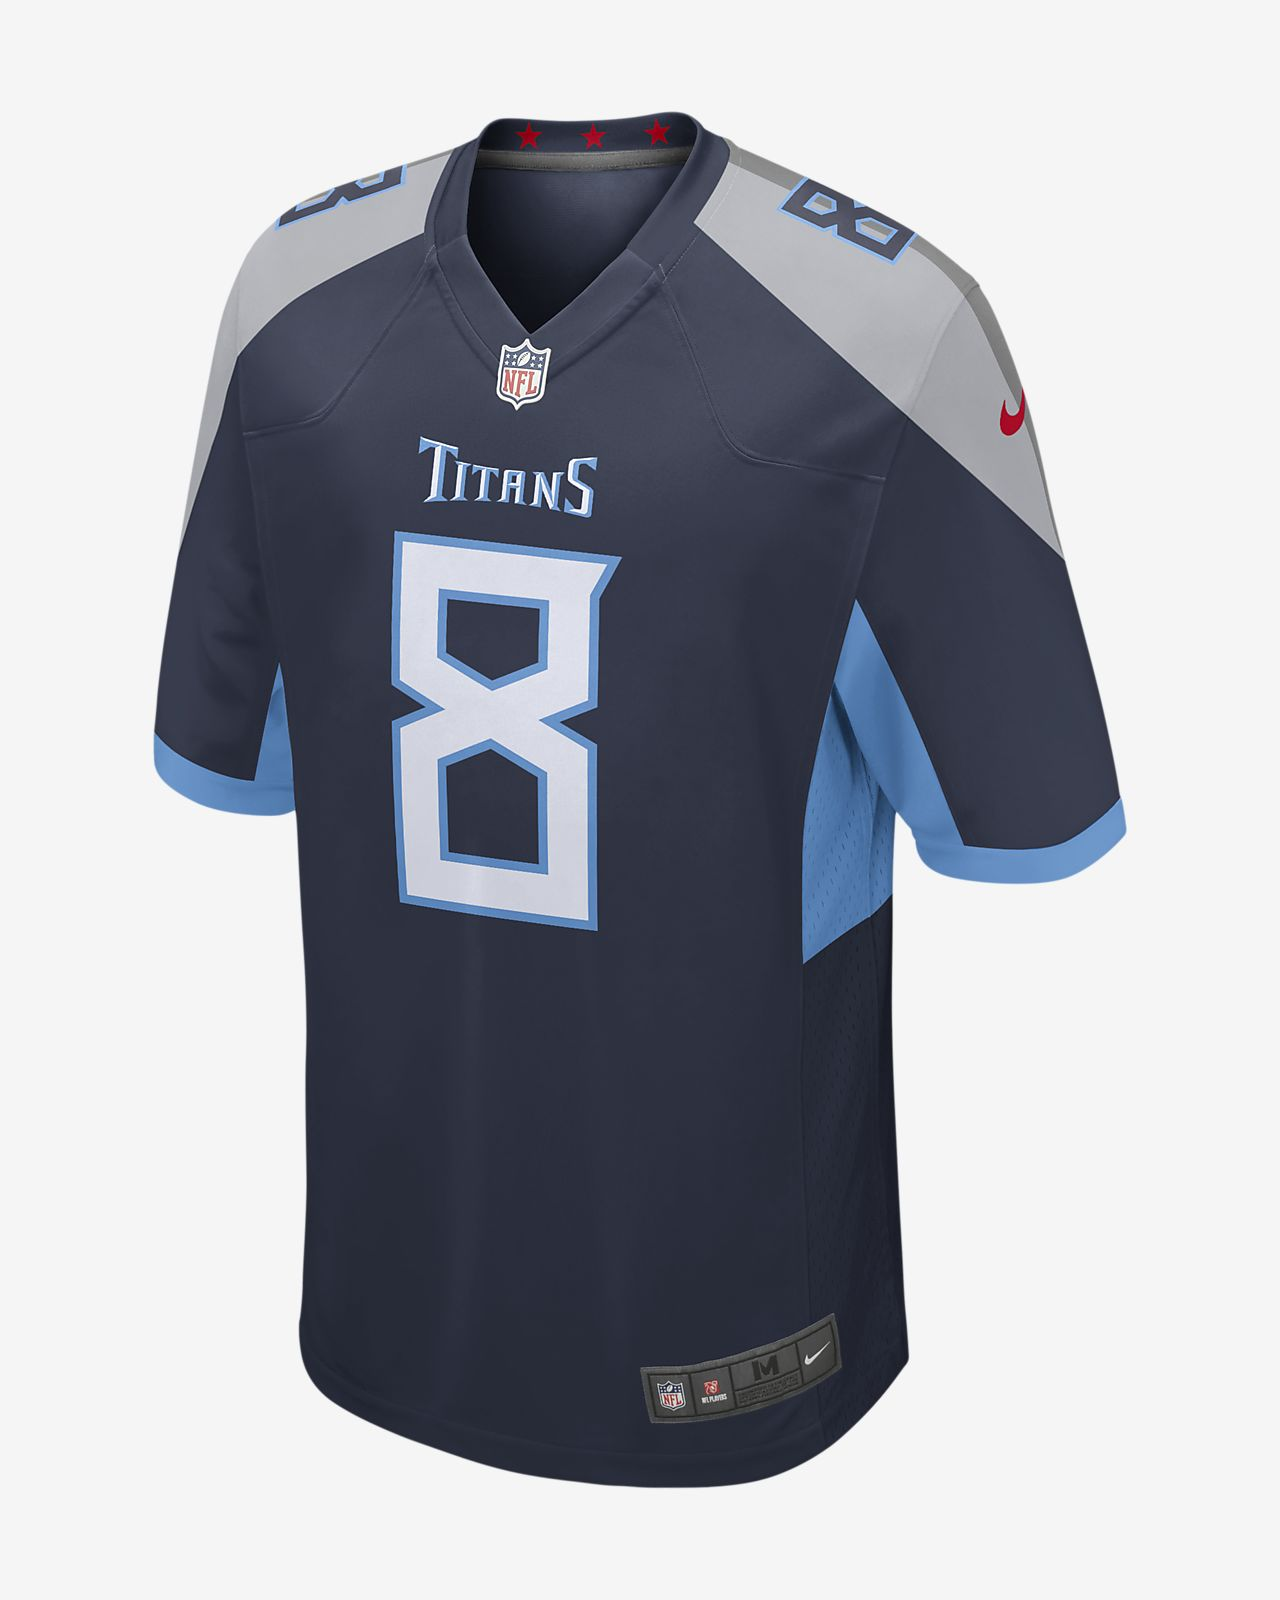 Pánský dres na americký fotbal NFL Tennessee Titans Game Jersey (Marcus Mariota)